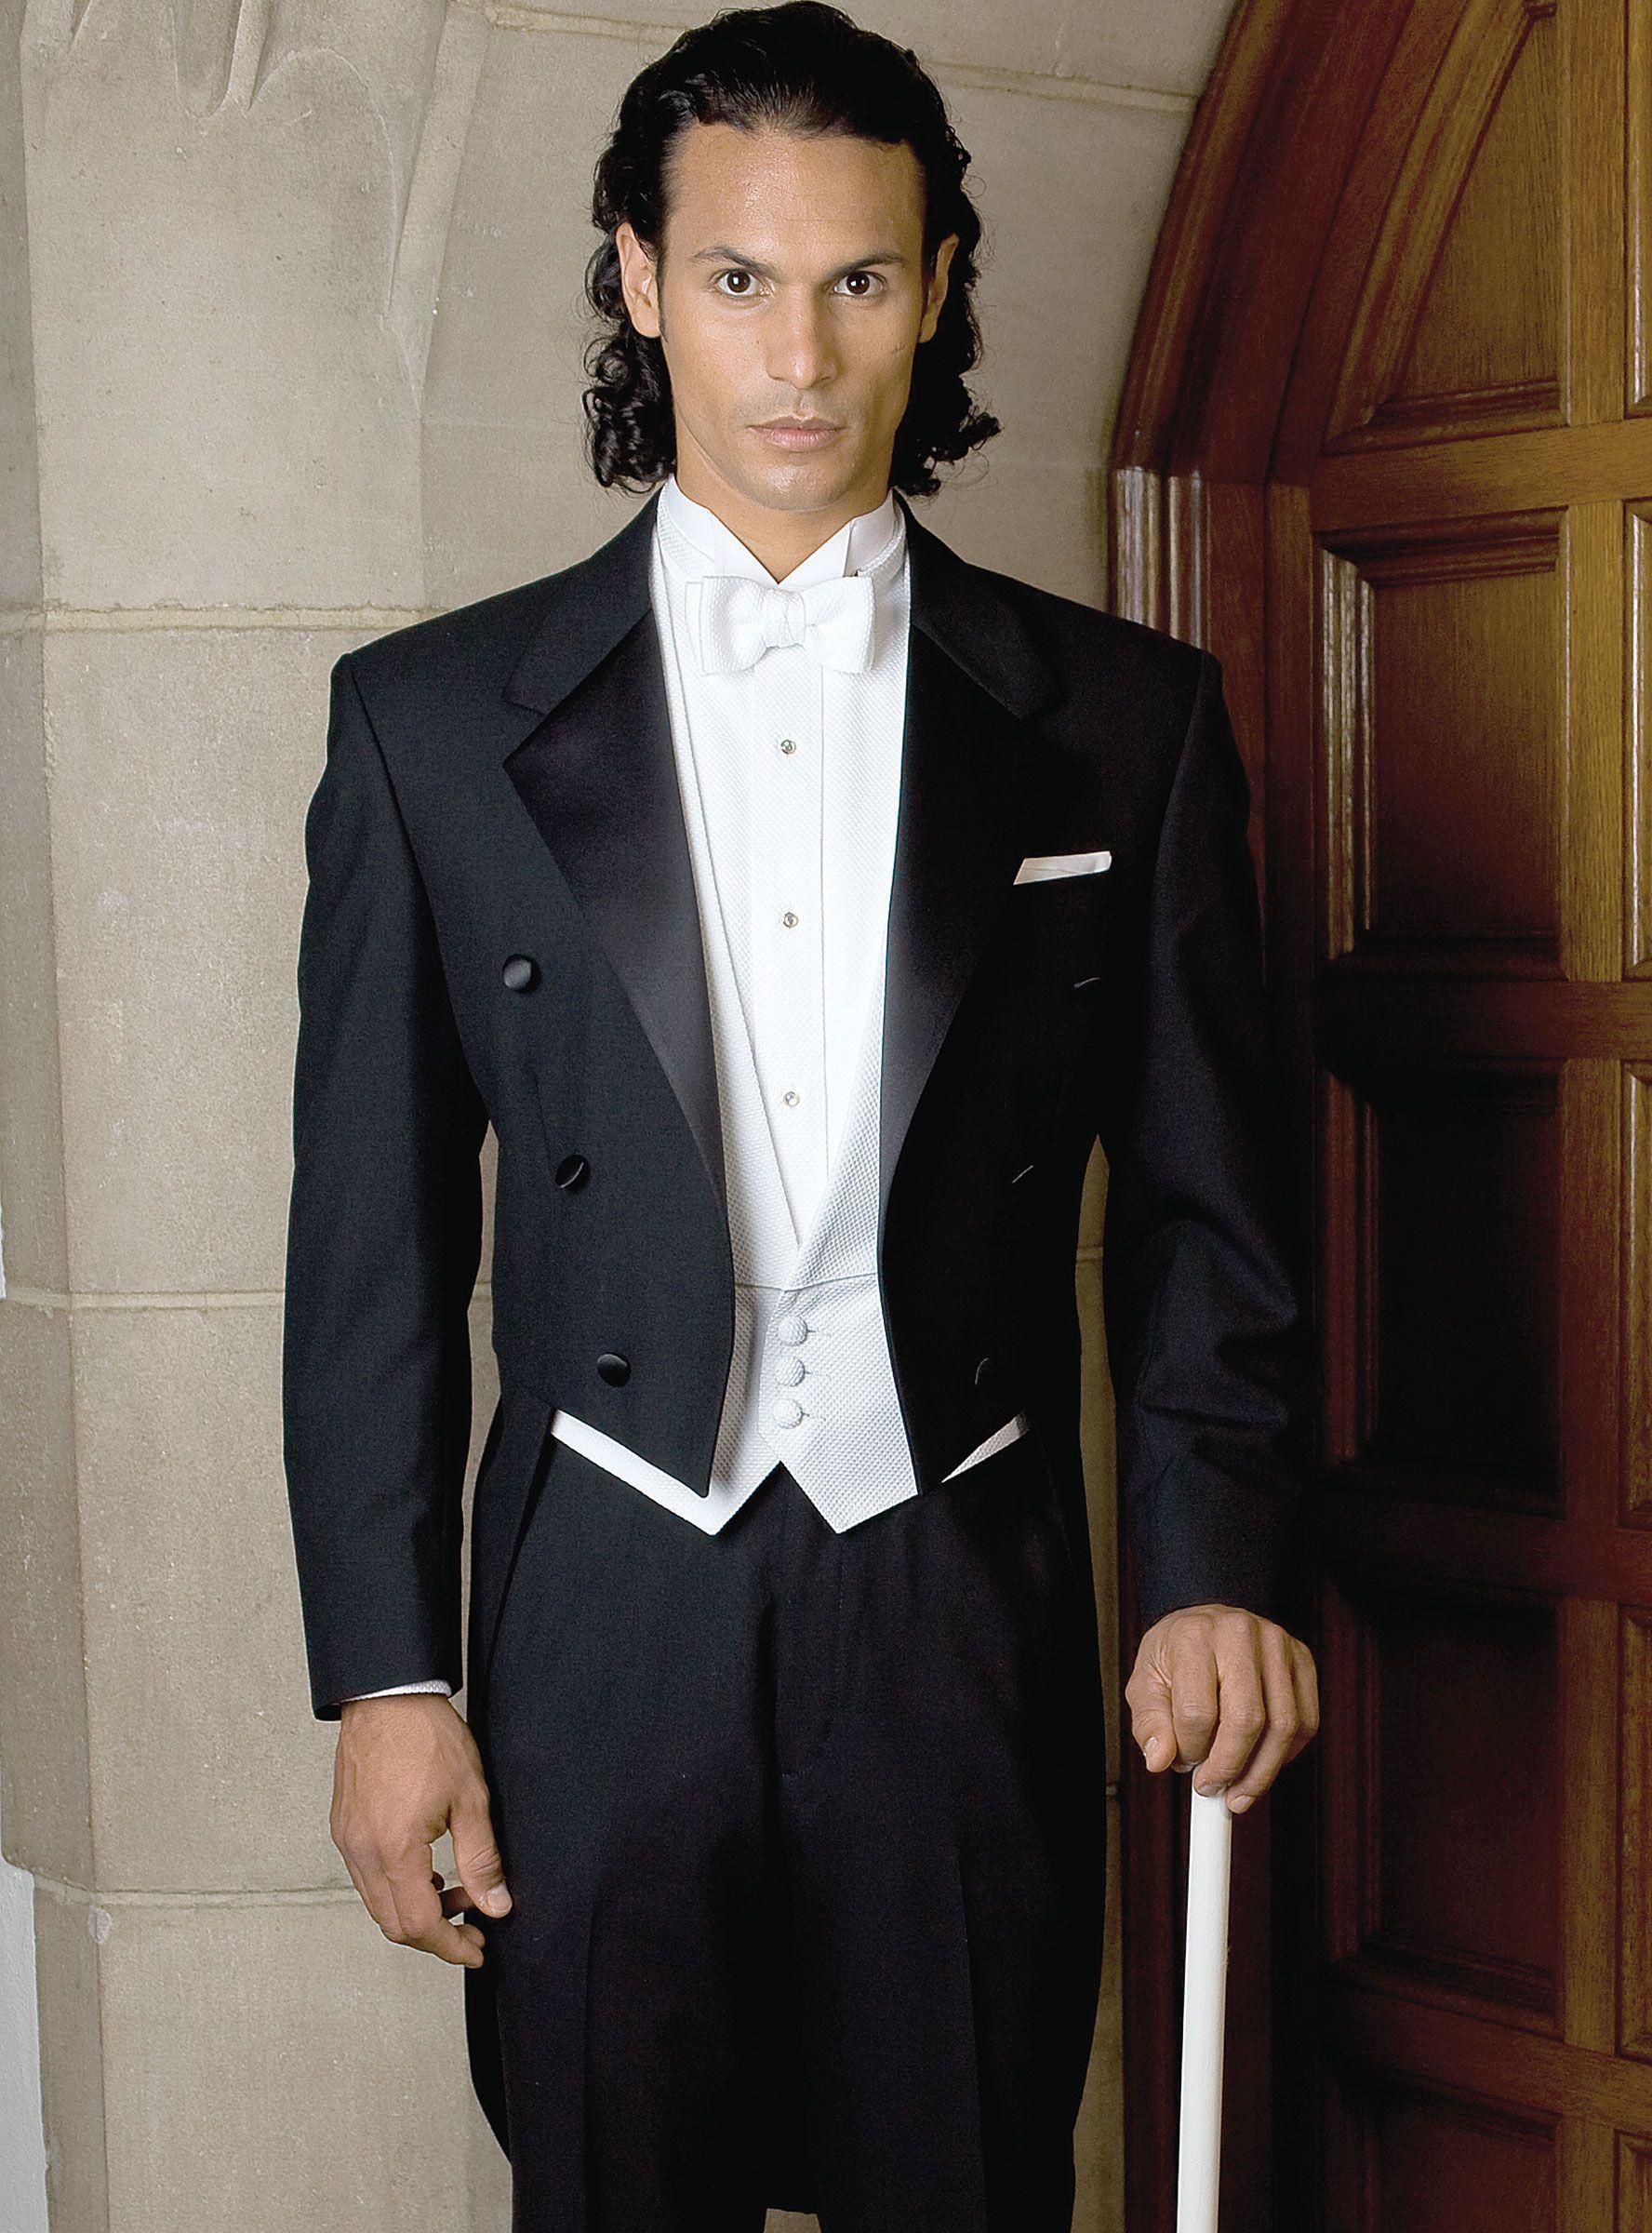 Wedding Tuxedo Rental Summer wedding suits, Mens summer